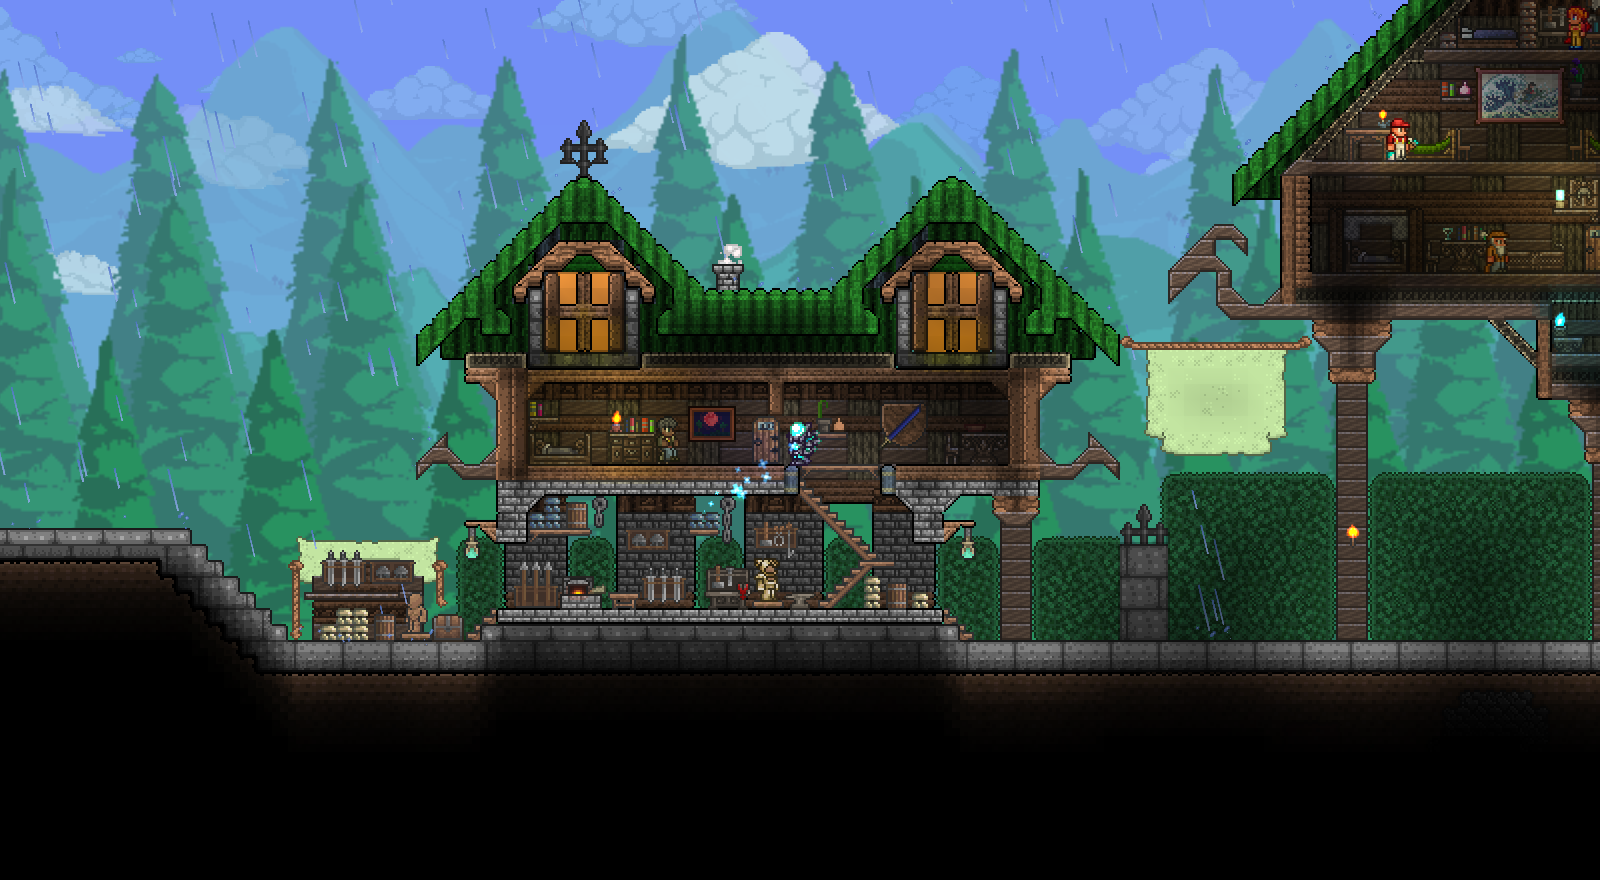 Doctor S House Garden Room